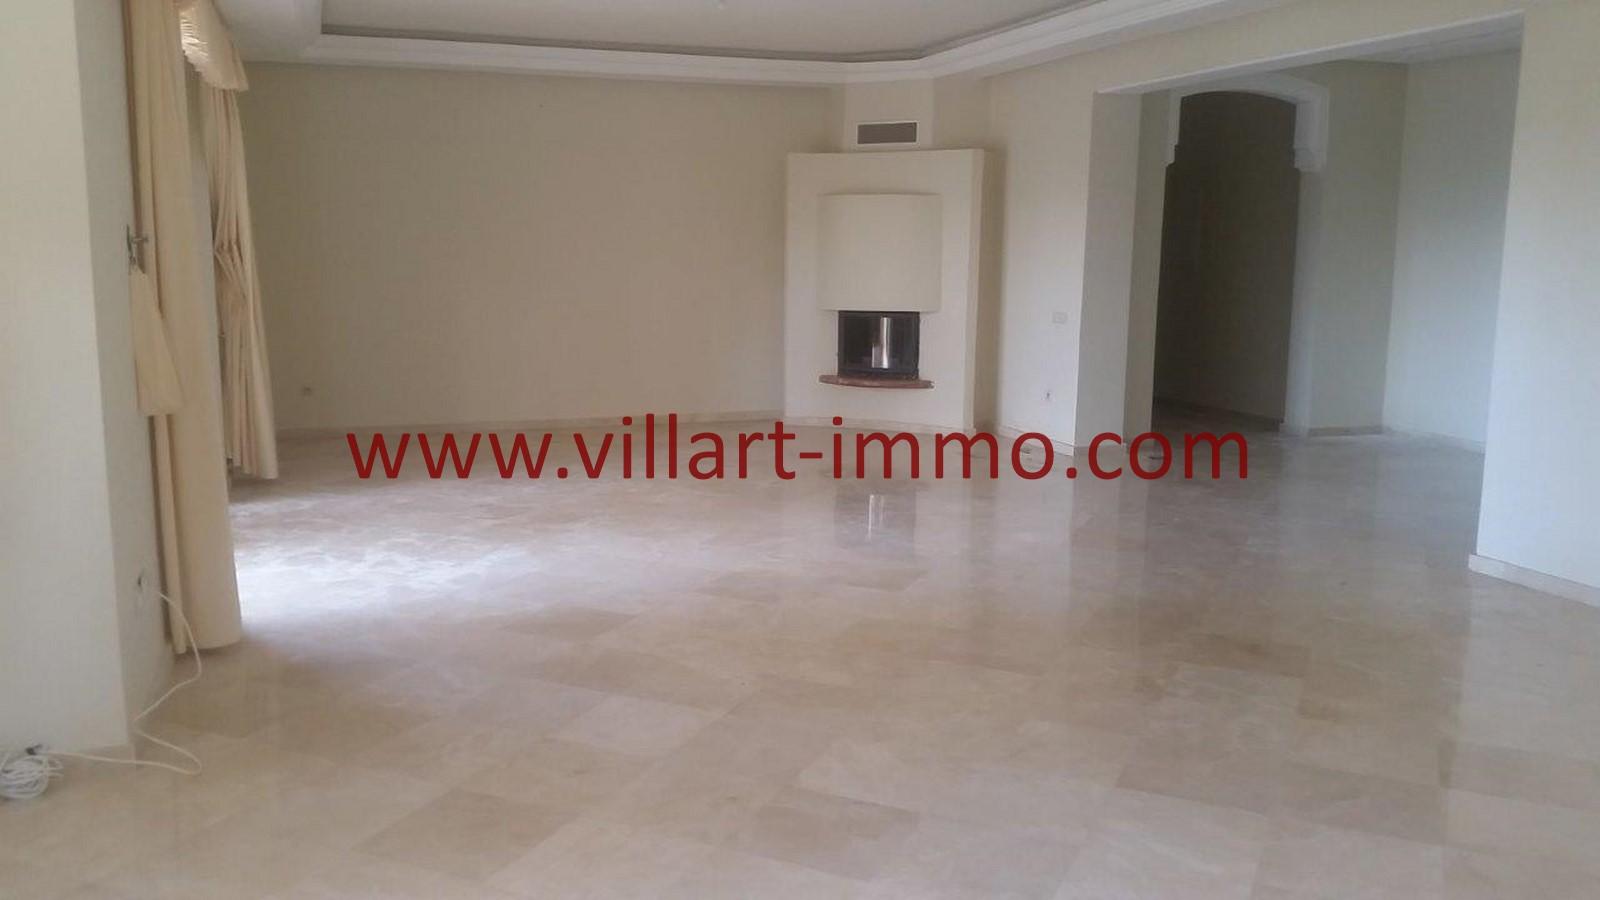 6-location-appartement-jbel-kebir-tanger-salon-2-l974-villart-immo